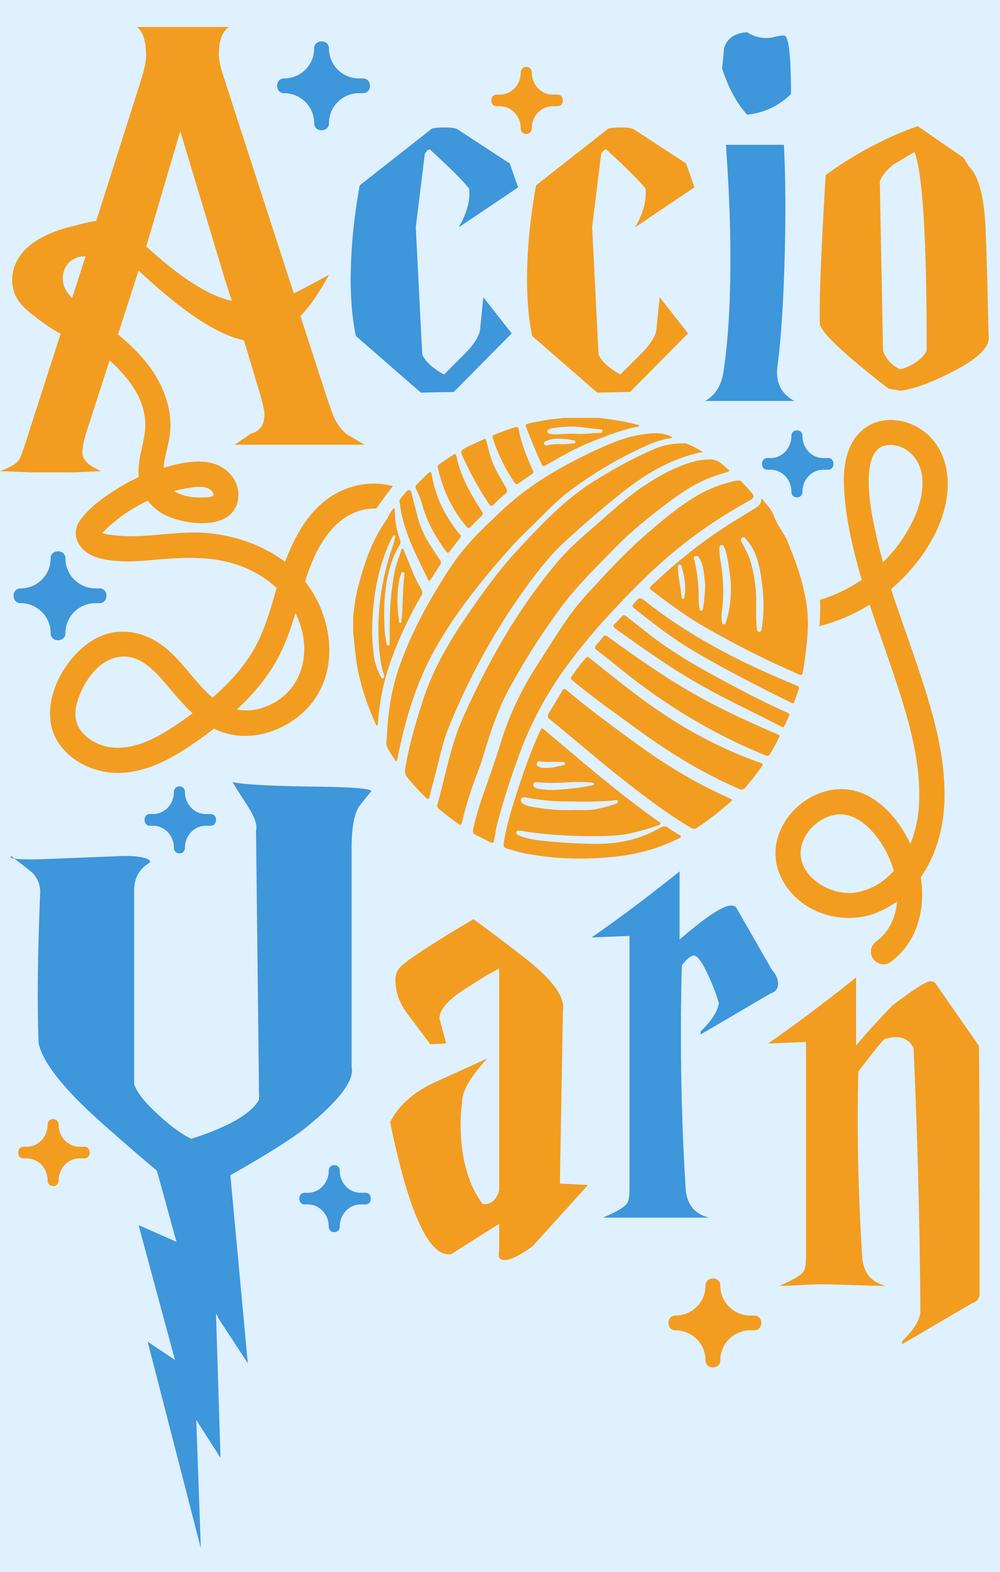 accio_yarn.png